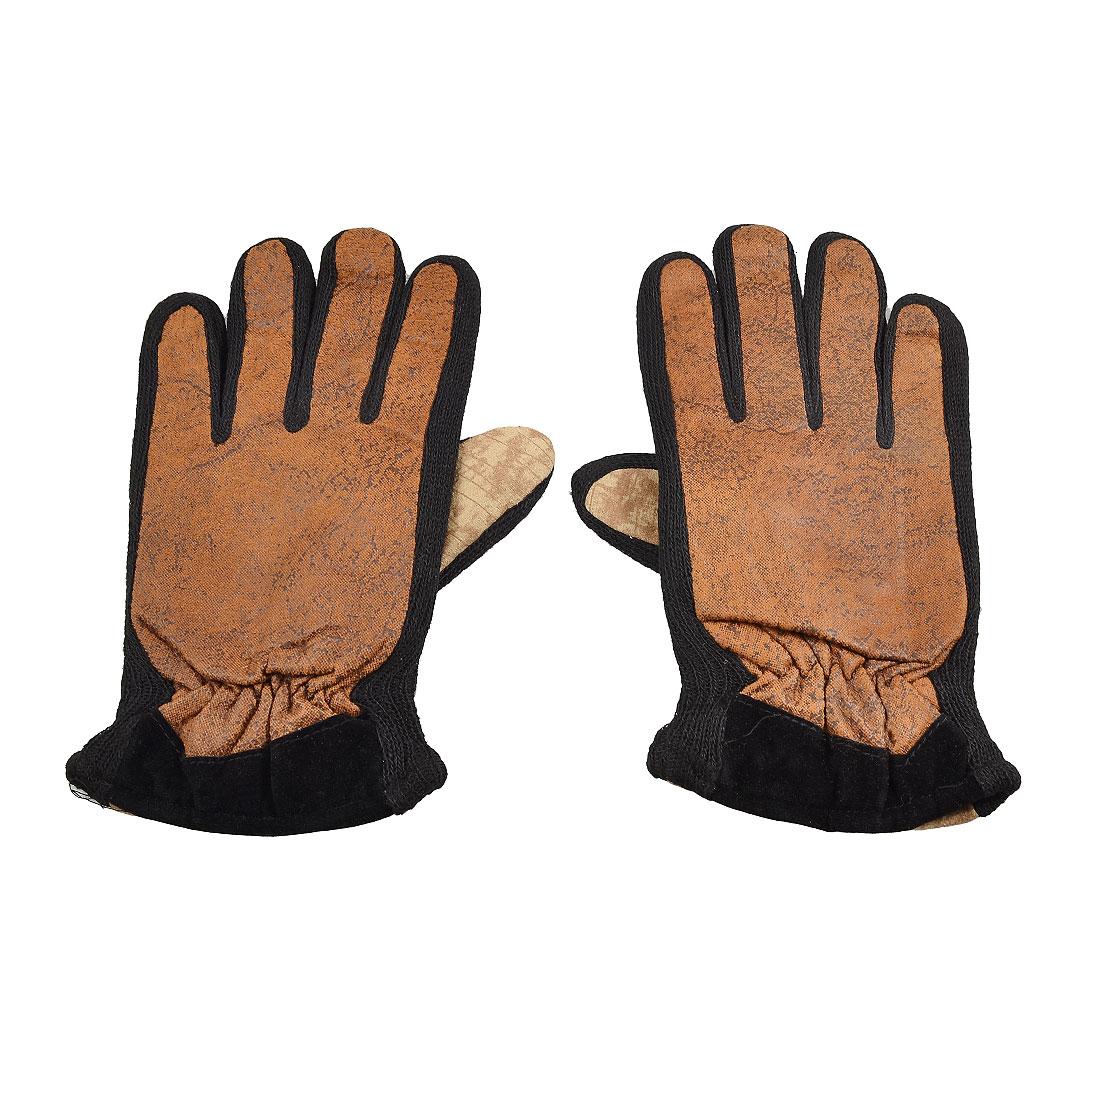 Pair Black Acrylic Brim Fleece Lining Full Fingers Winter Gloves Beige Brown